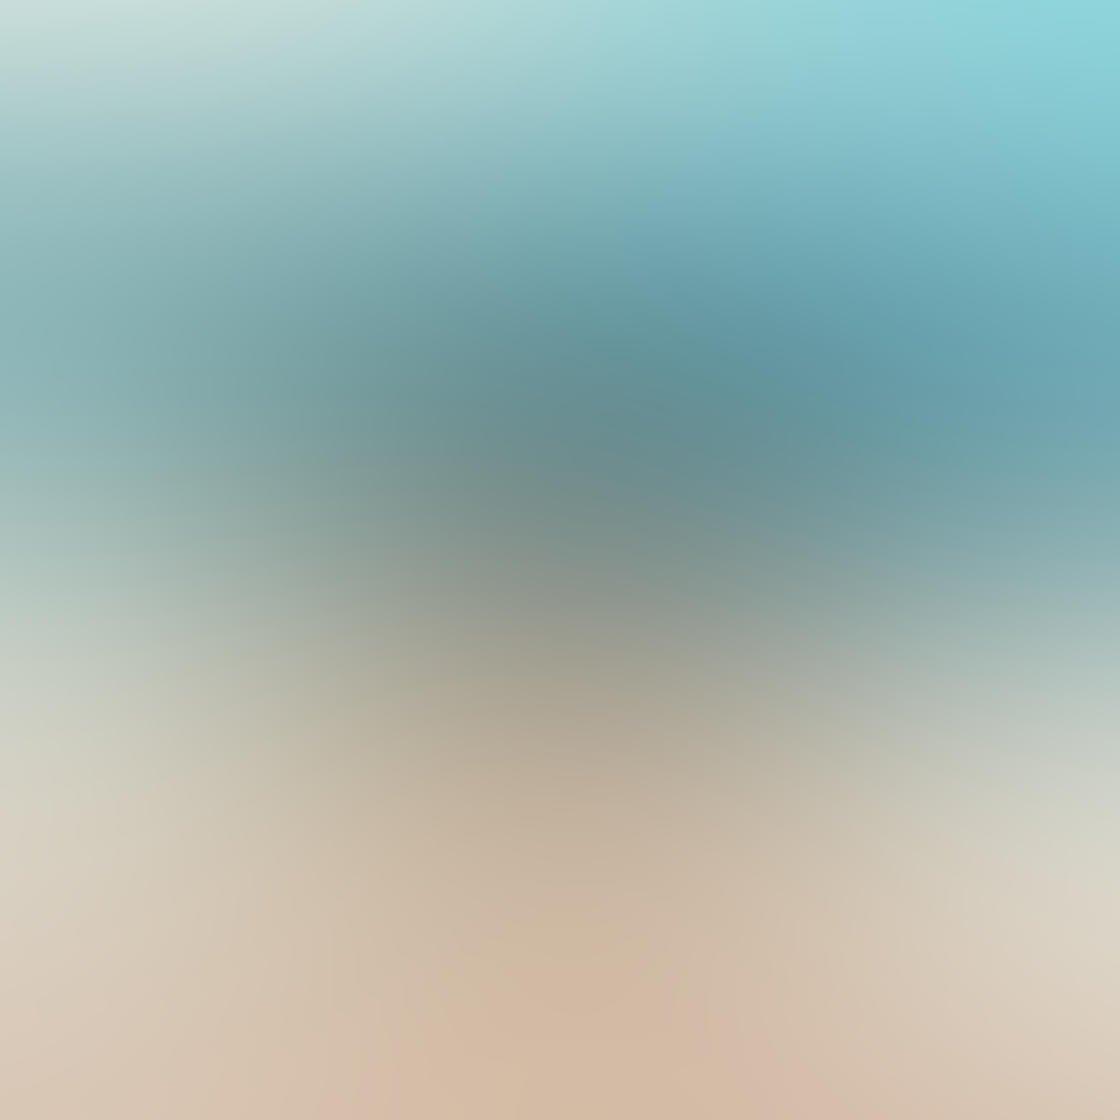 iPhone Photo Vignette 12